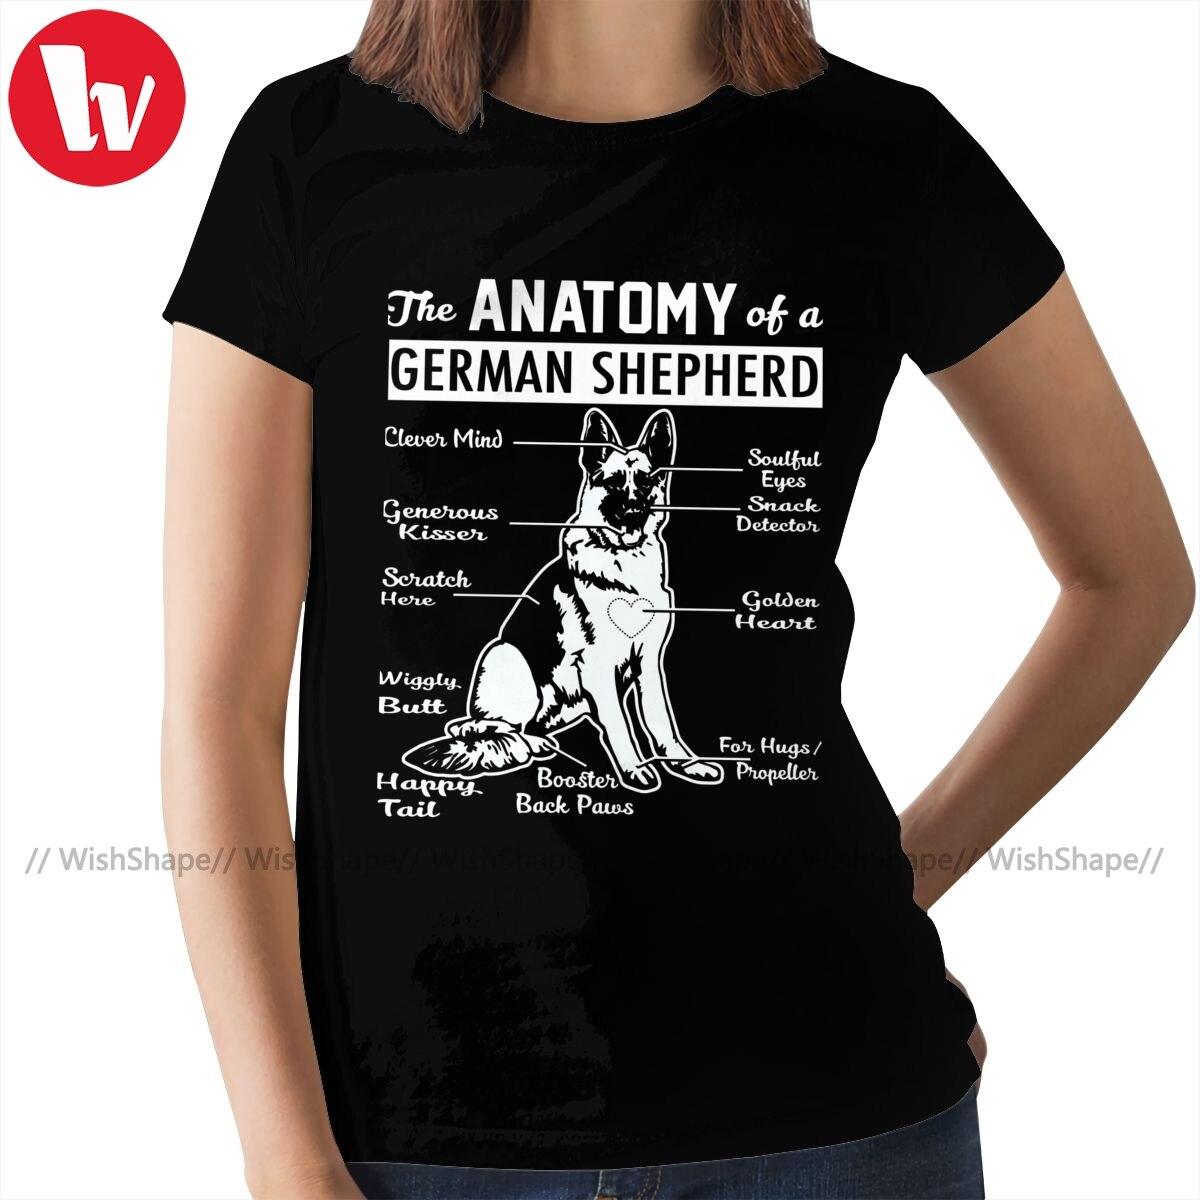 German Shepherd T-Shirt The Anatomy T Shirt Street Fashion Short Sleeve Women tshirt O Neck Ladies Tee Shirt